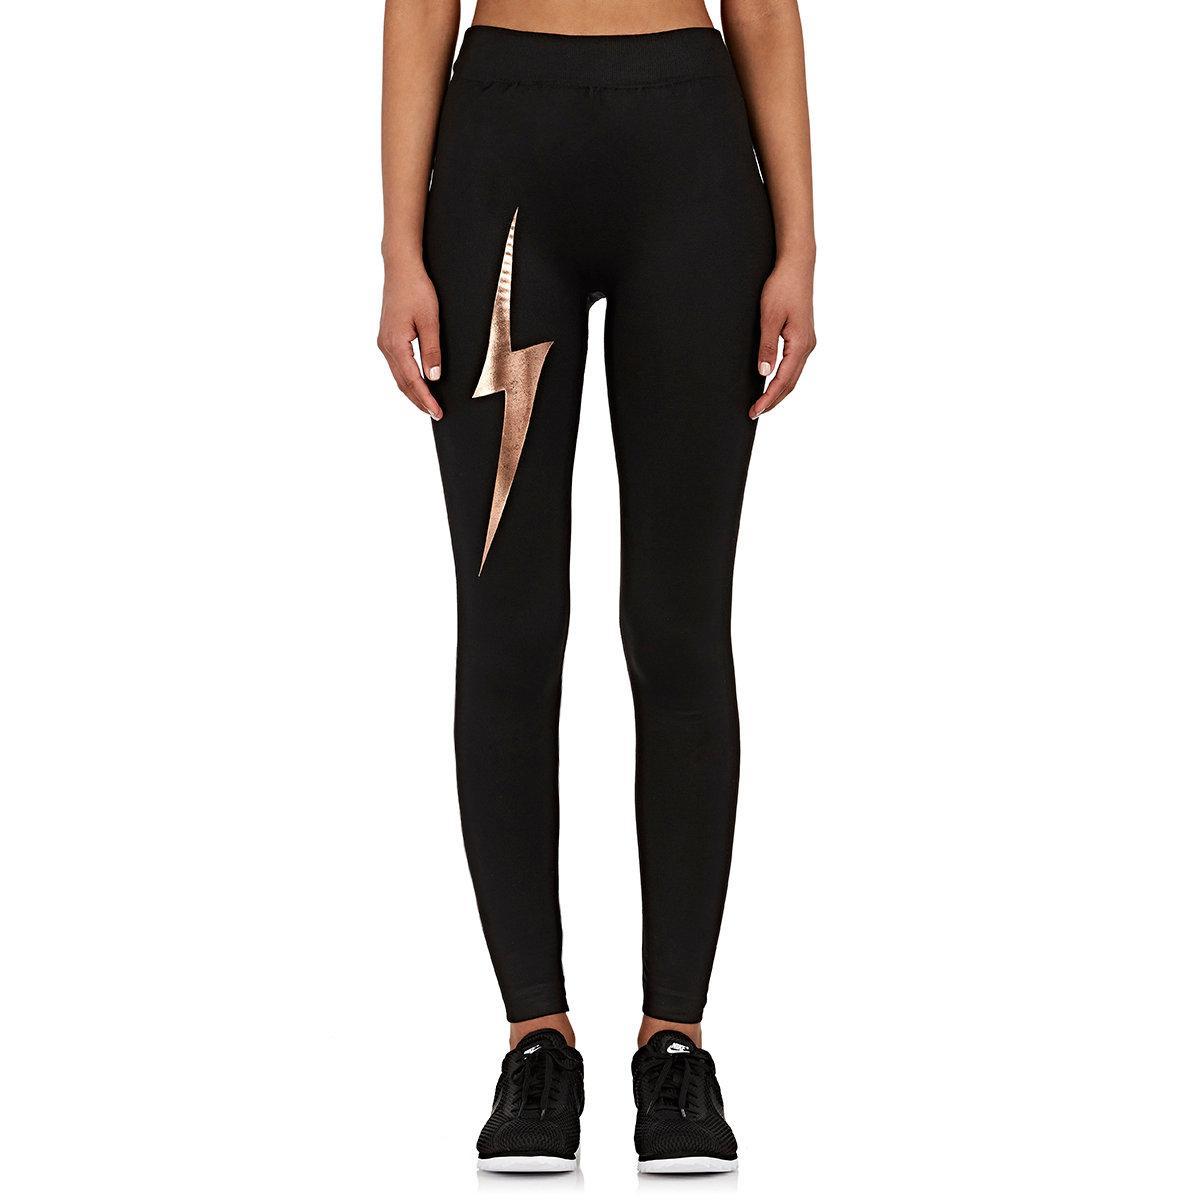 Electric Yoga Bolt Leggings In Black